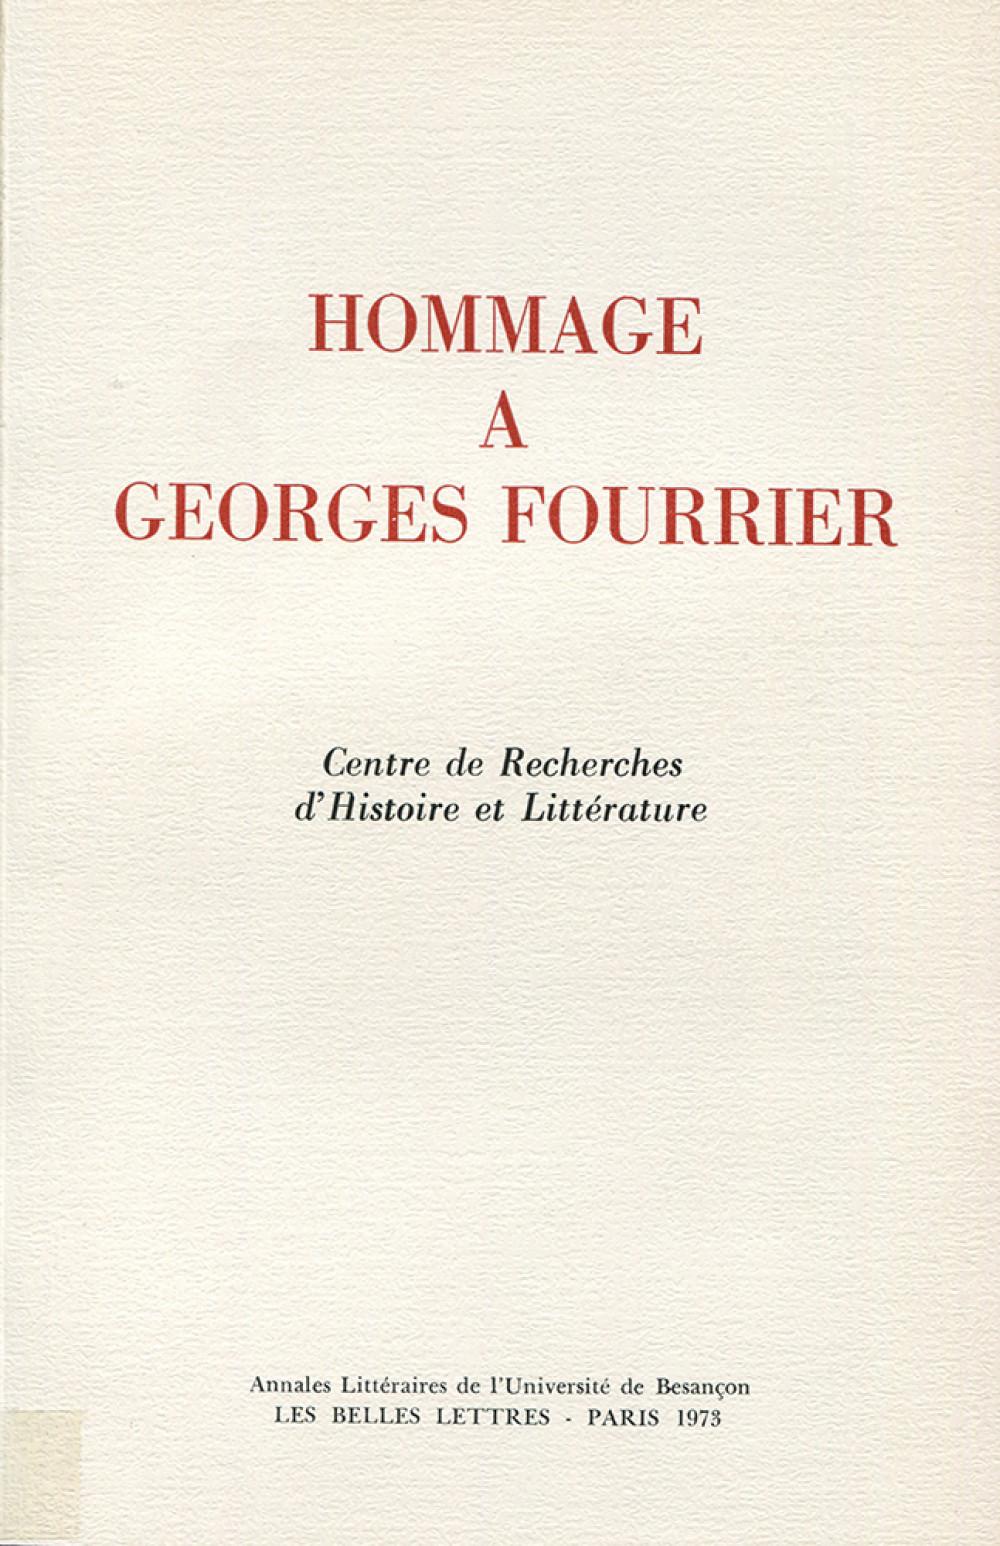 Hommage à Georges Fourrier